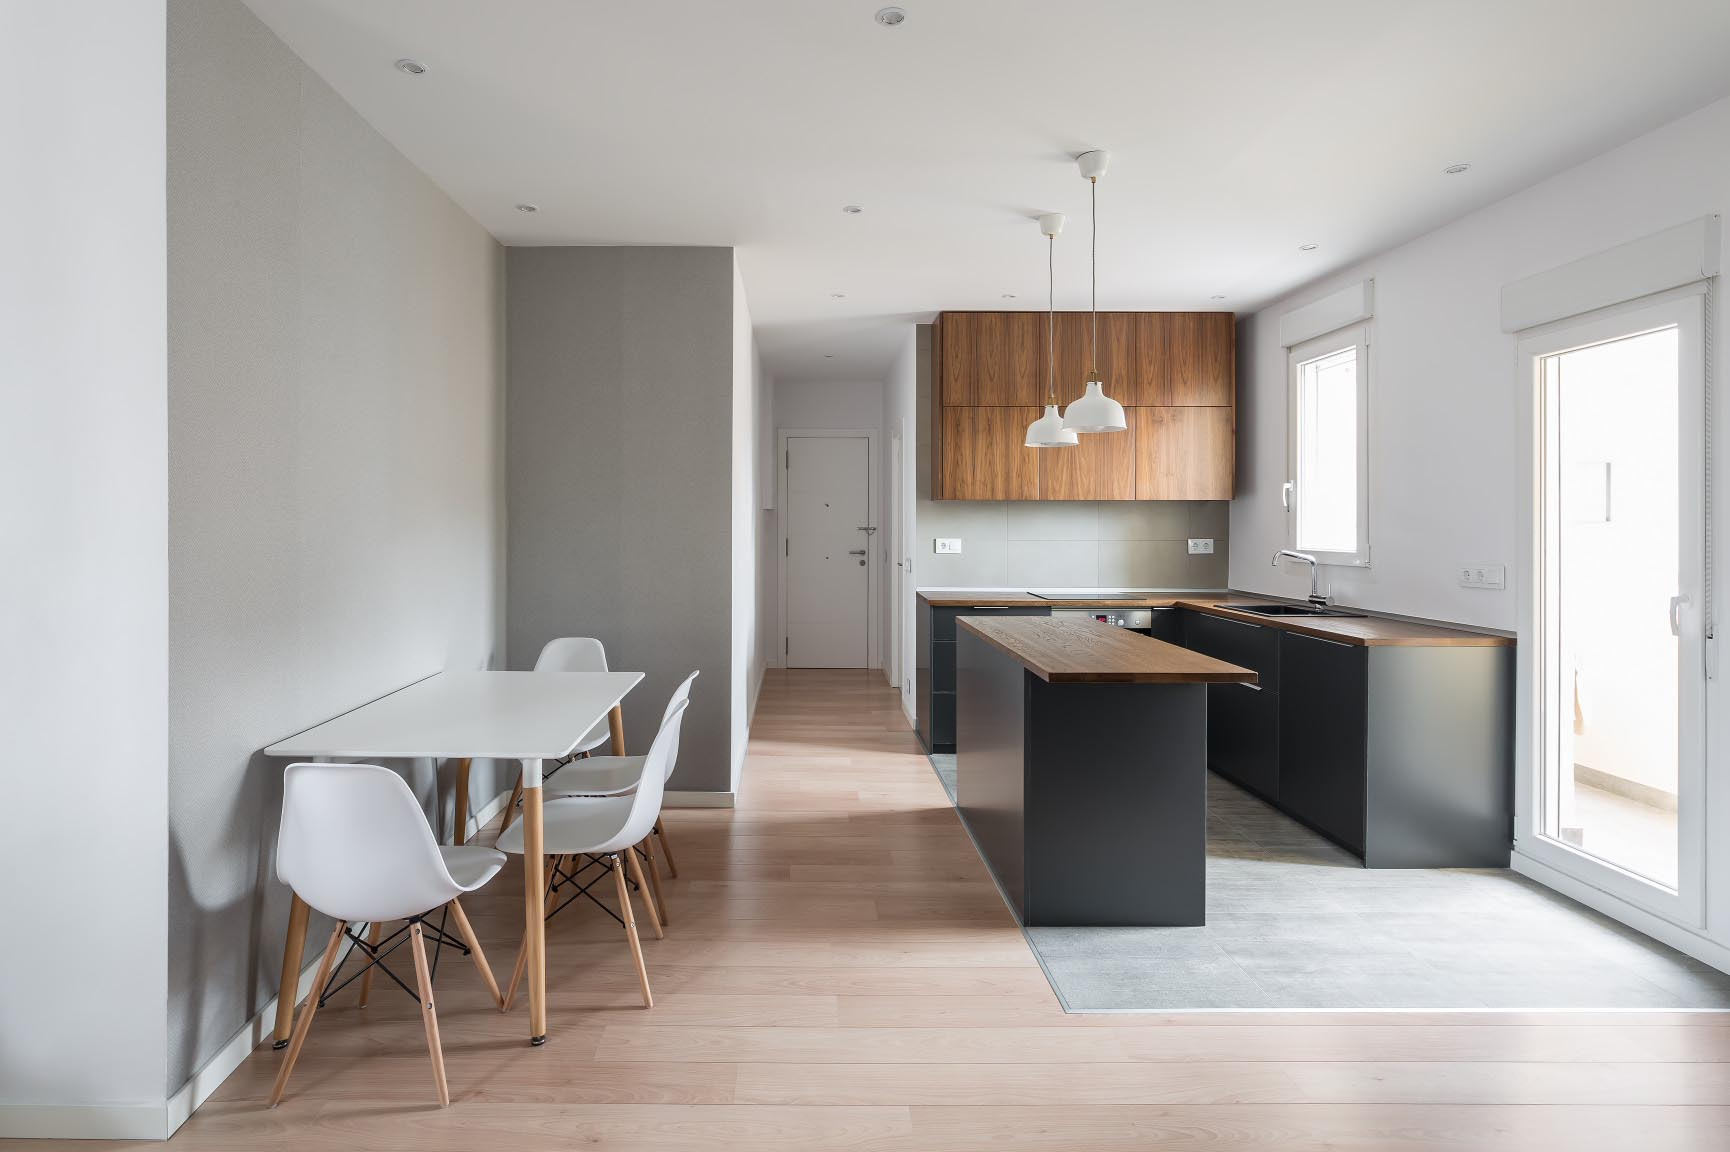 fotografia-arquitectura-interiorismo-valencia-german-cabo-lliberos-alboraya (x)_portada